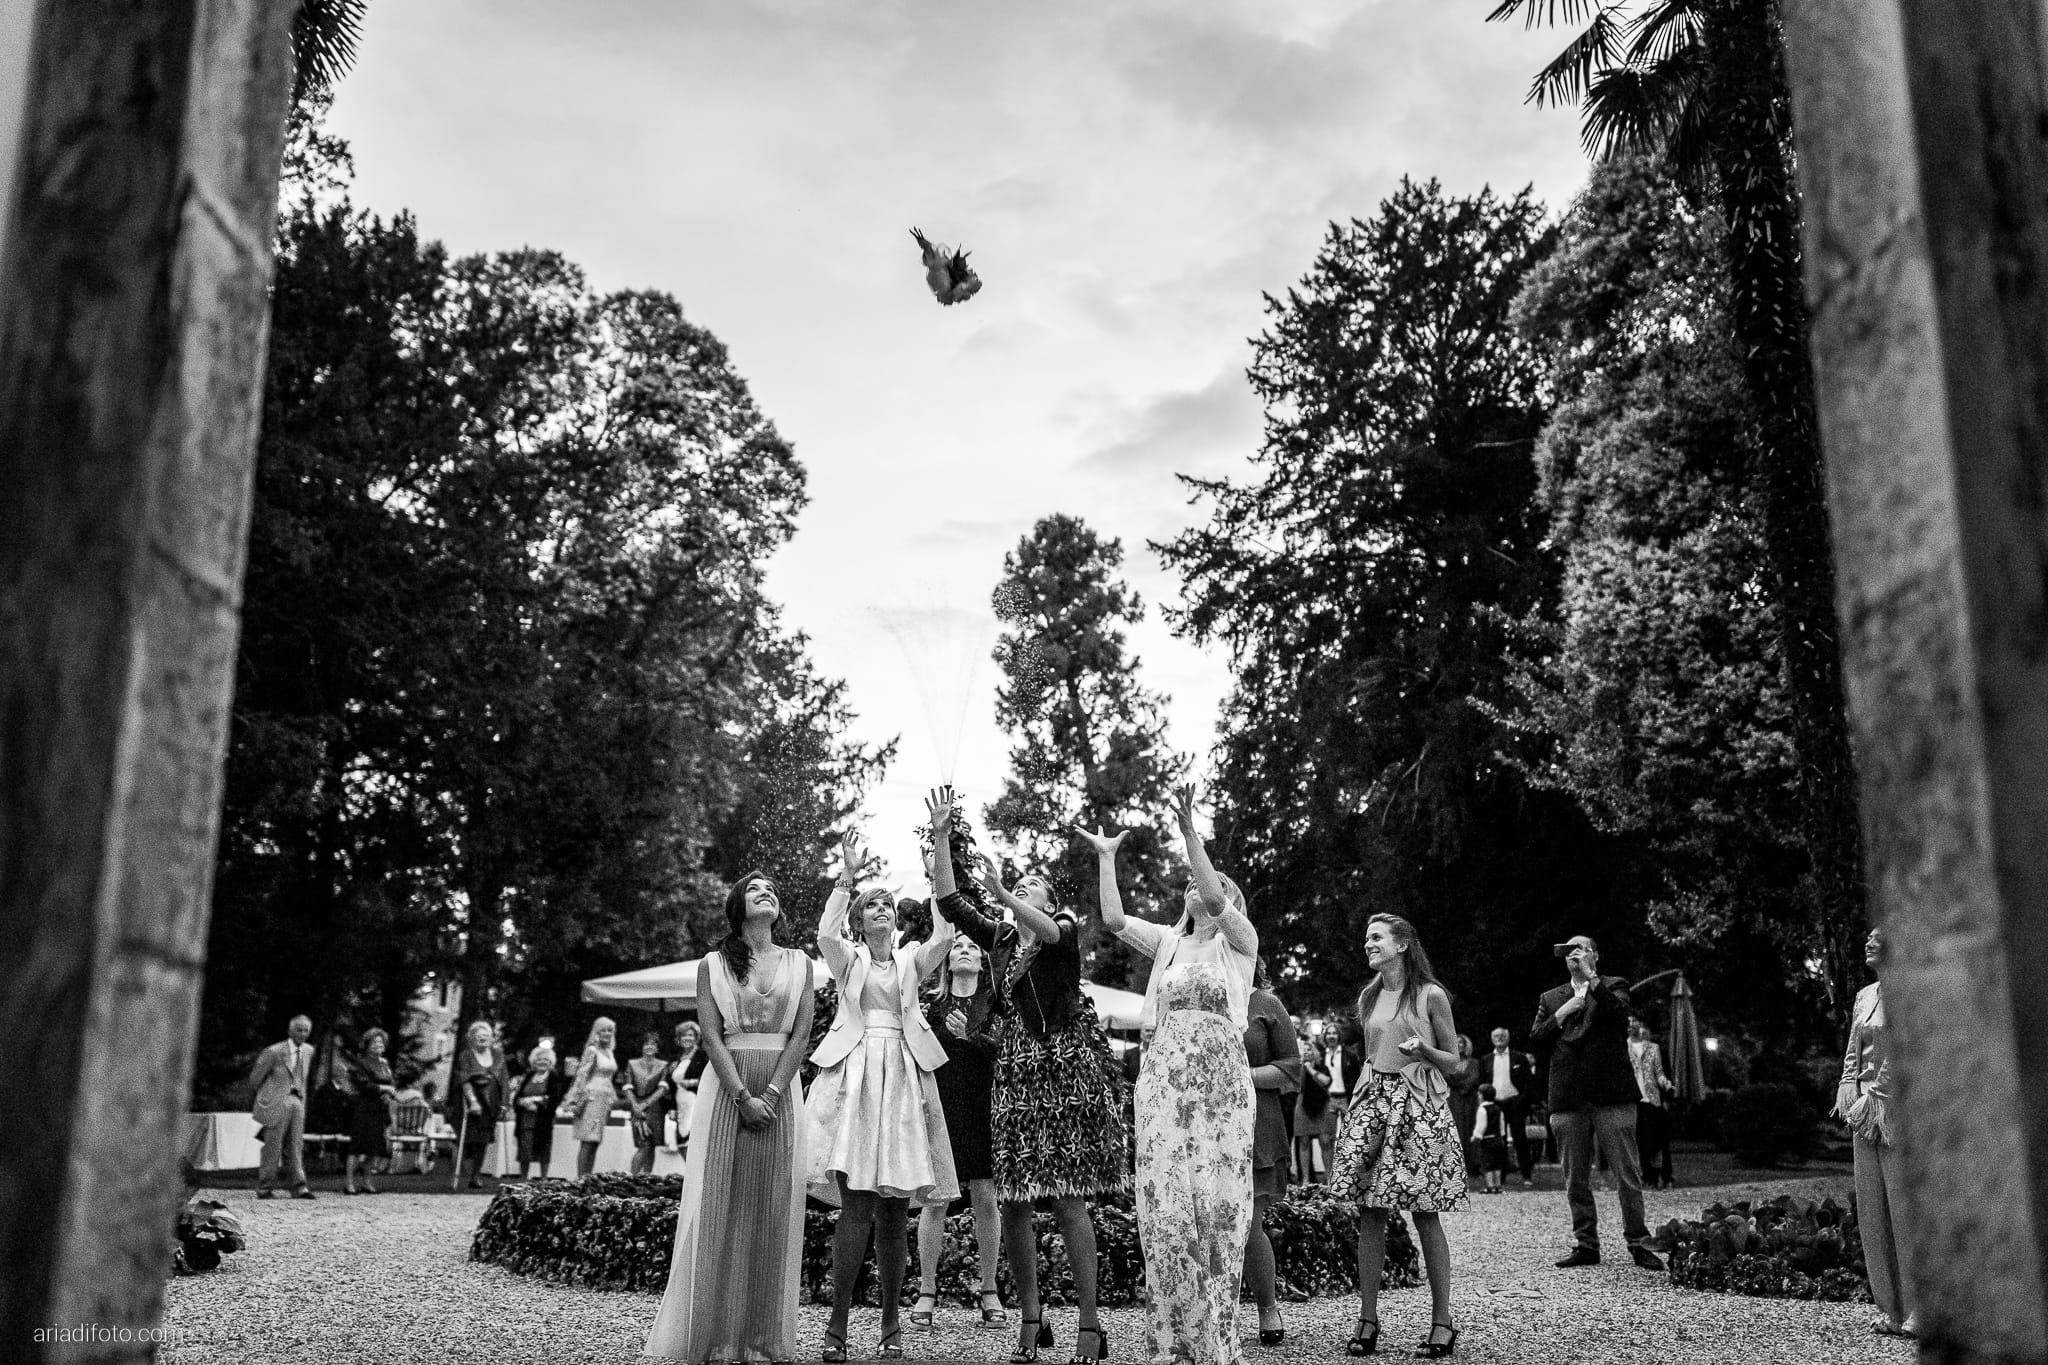 Lavinia Daniele Matrimonio Medea Gorizia Villa Elodia Trivignano Udinese Udine ricevimento lancio del bouquet